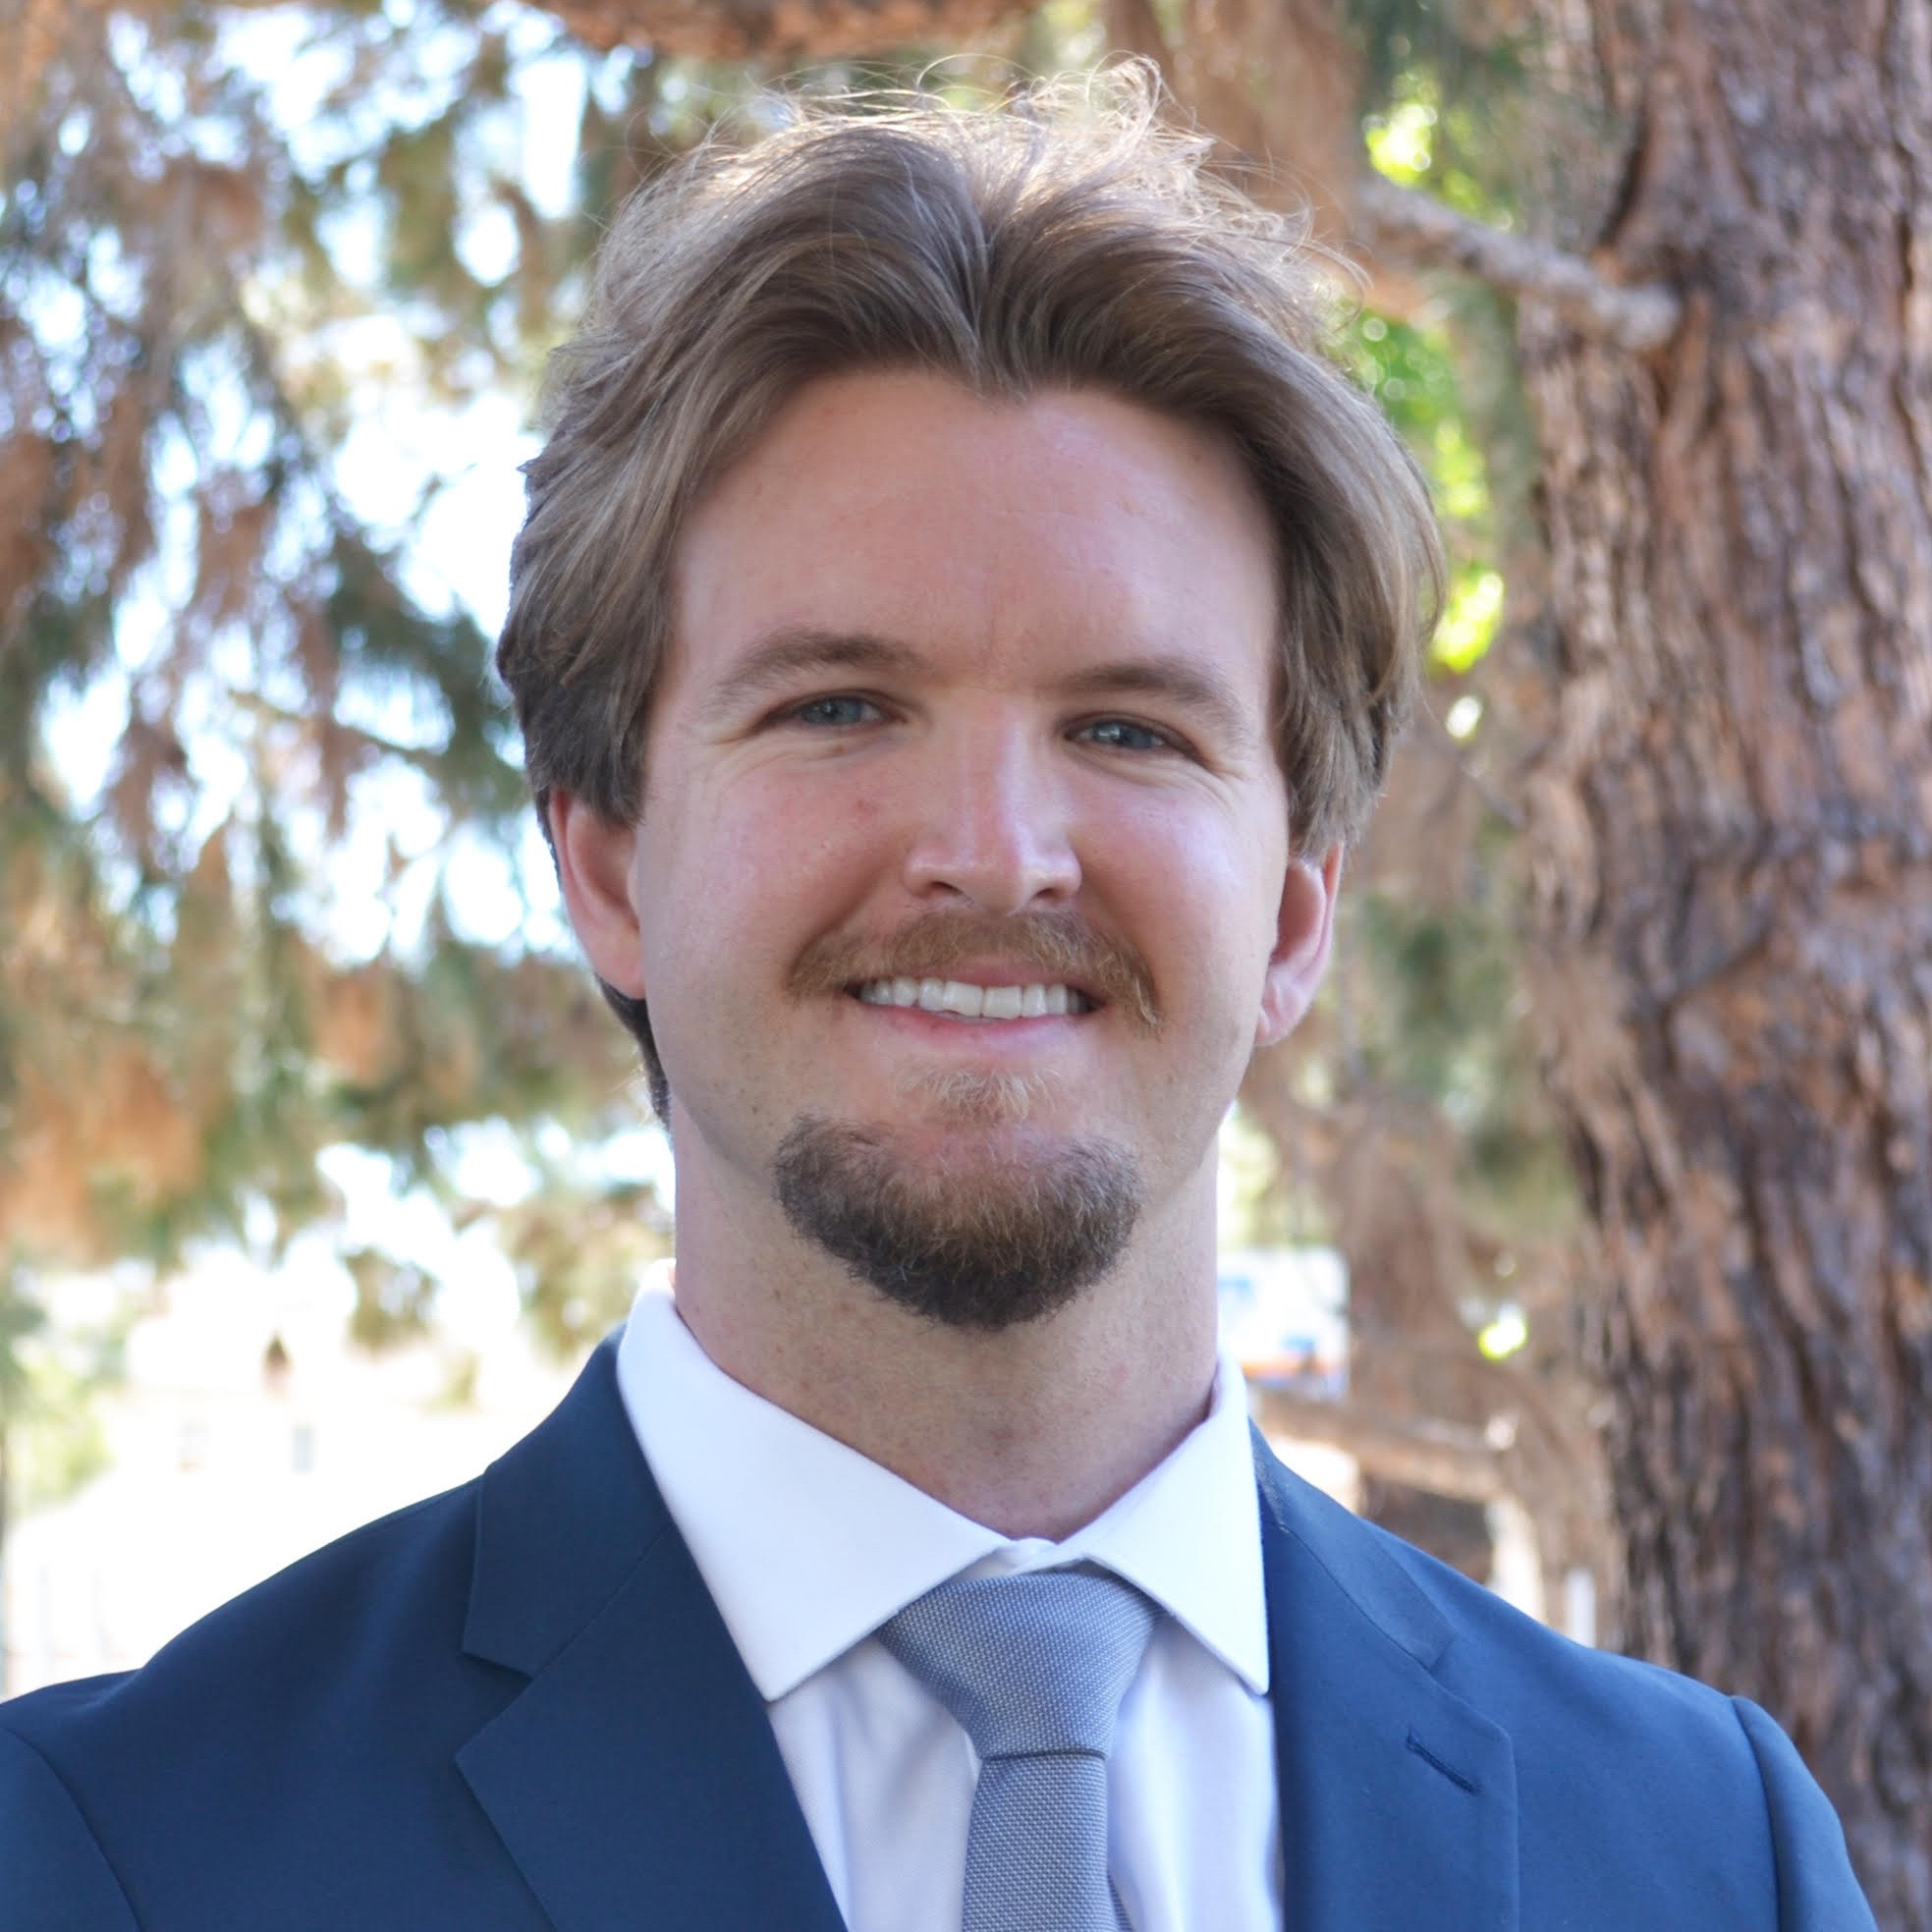 Kyle Eckermann - SPECIALTIESCollege/New Grads, Leadership, Music, Retail ManagementCalifornia State UniversityFullerton CollegeBrandman Chapman University